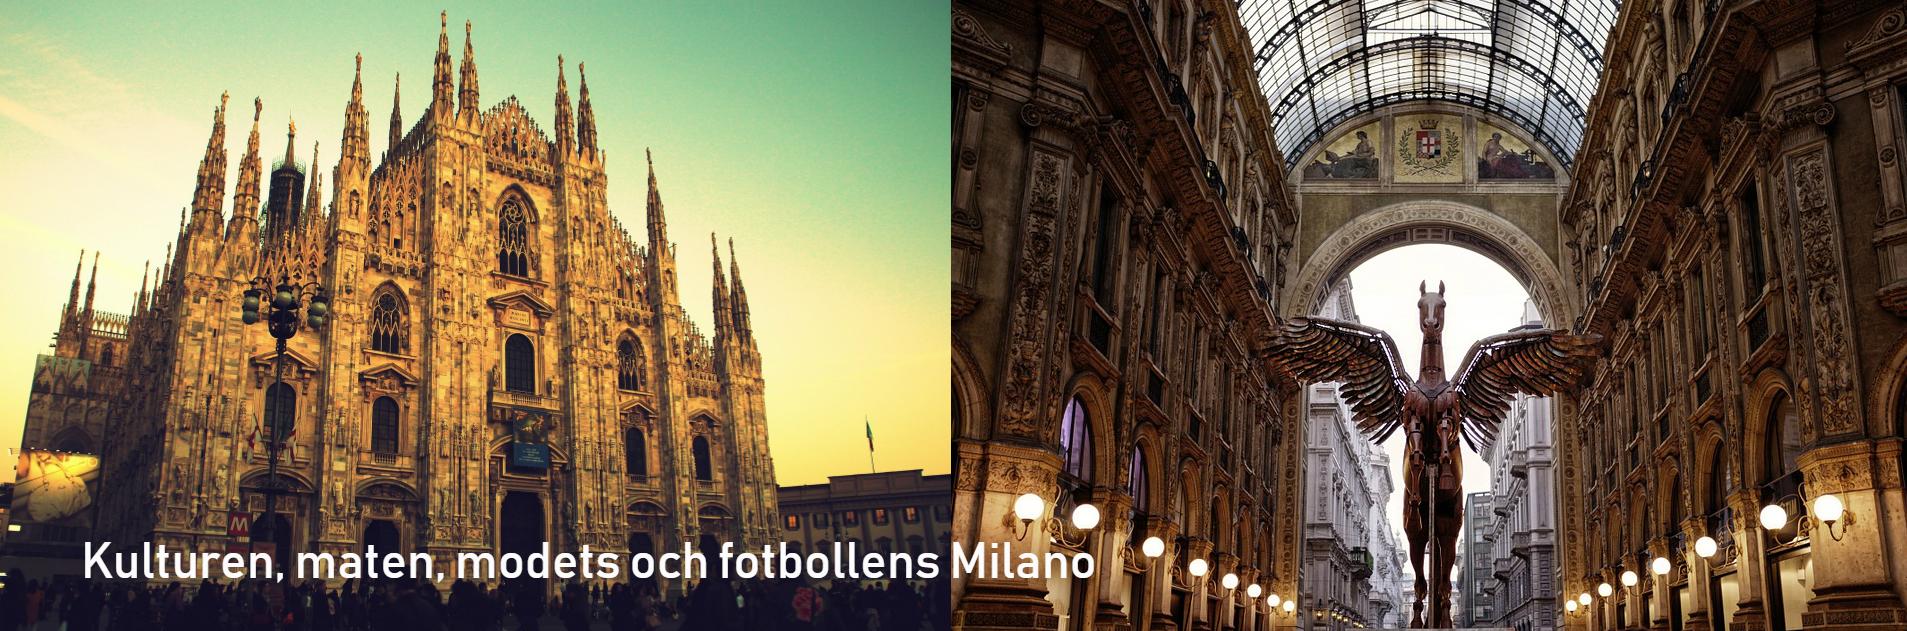 Milano banner